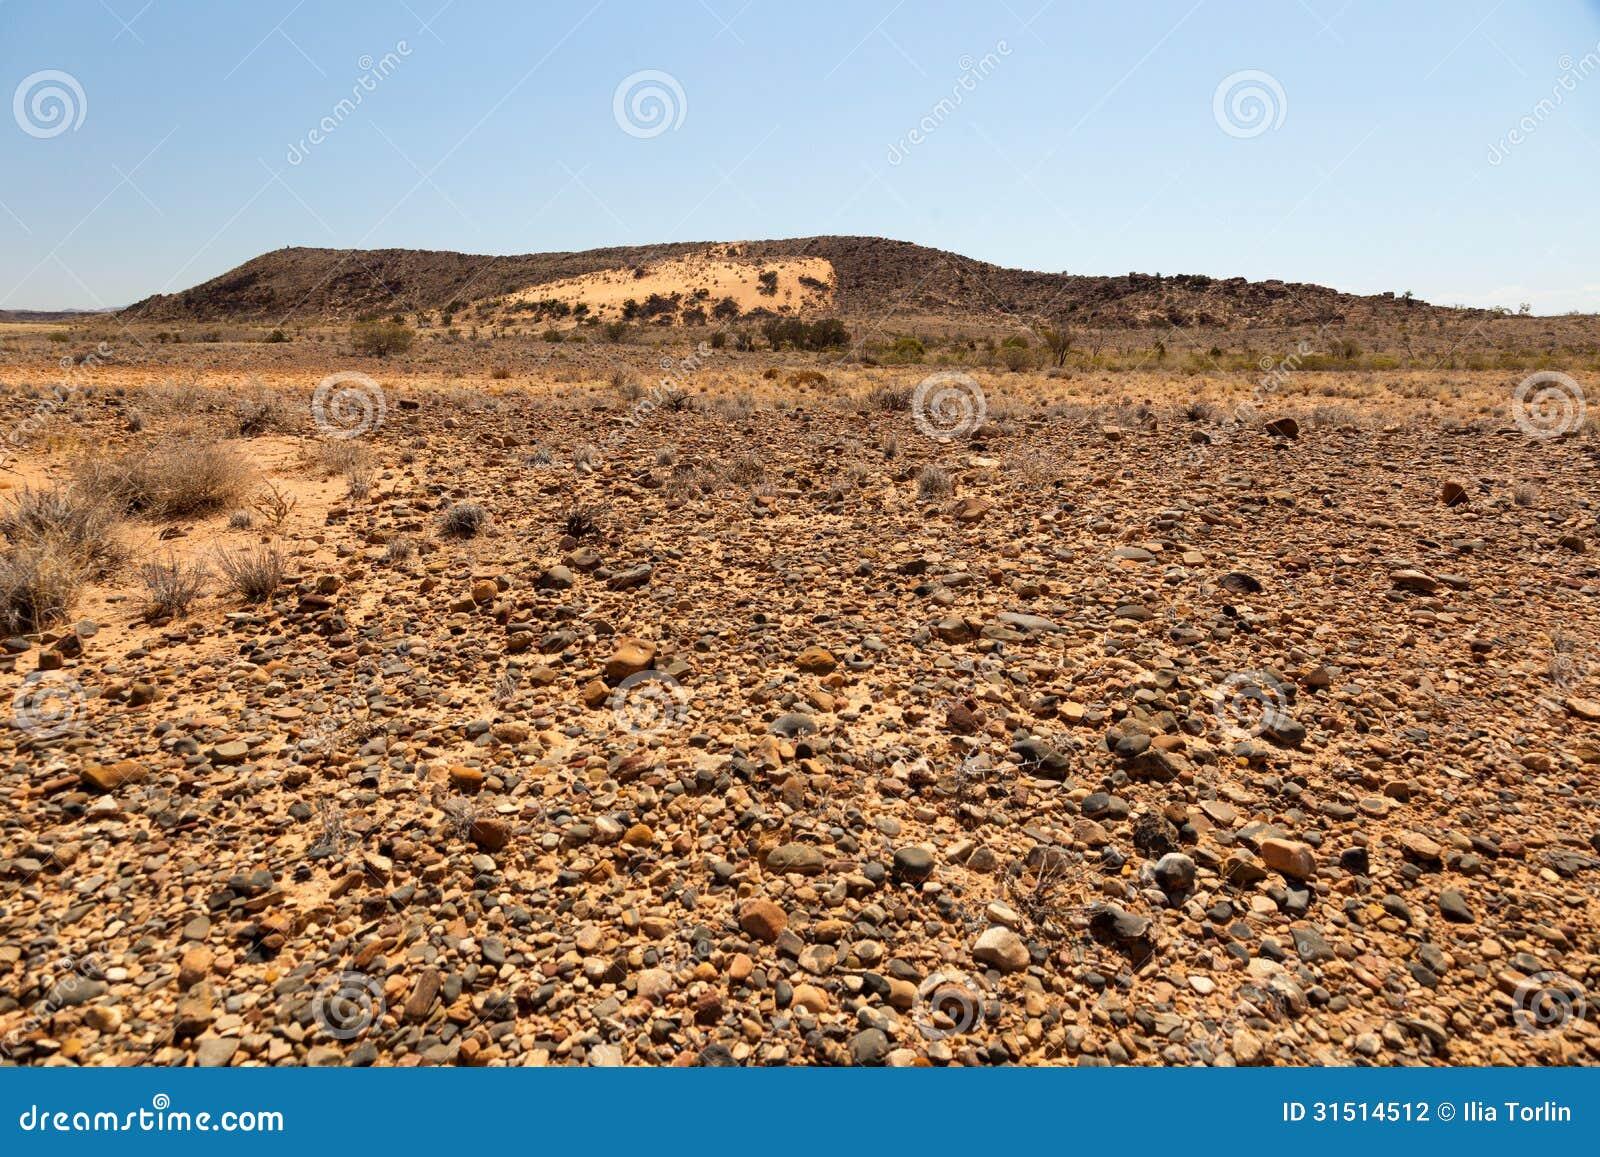 Flinders ranges landscape south australia stock for Landscapers adelaide western suburbs